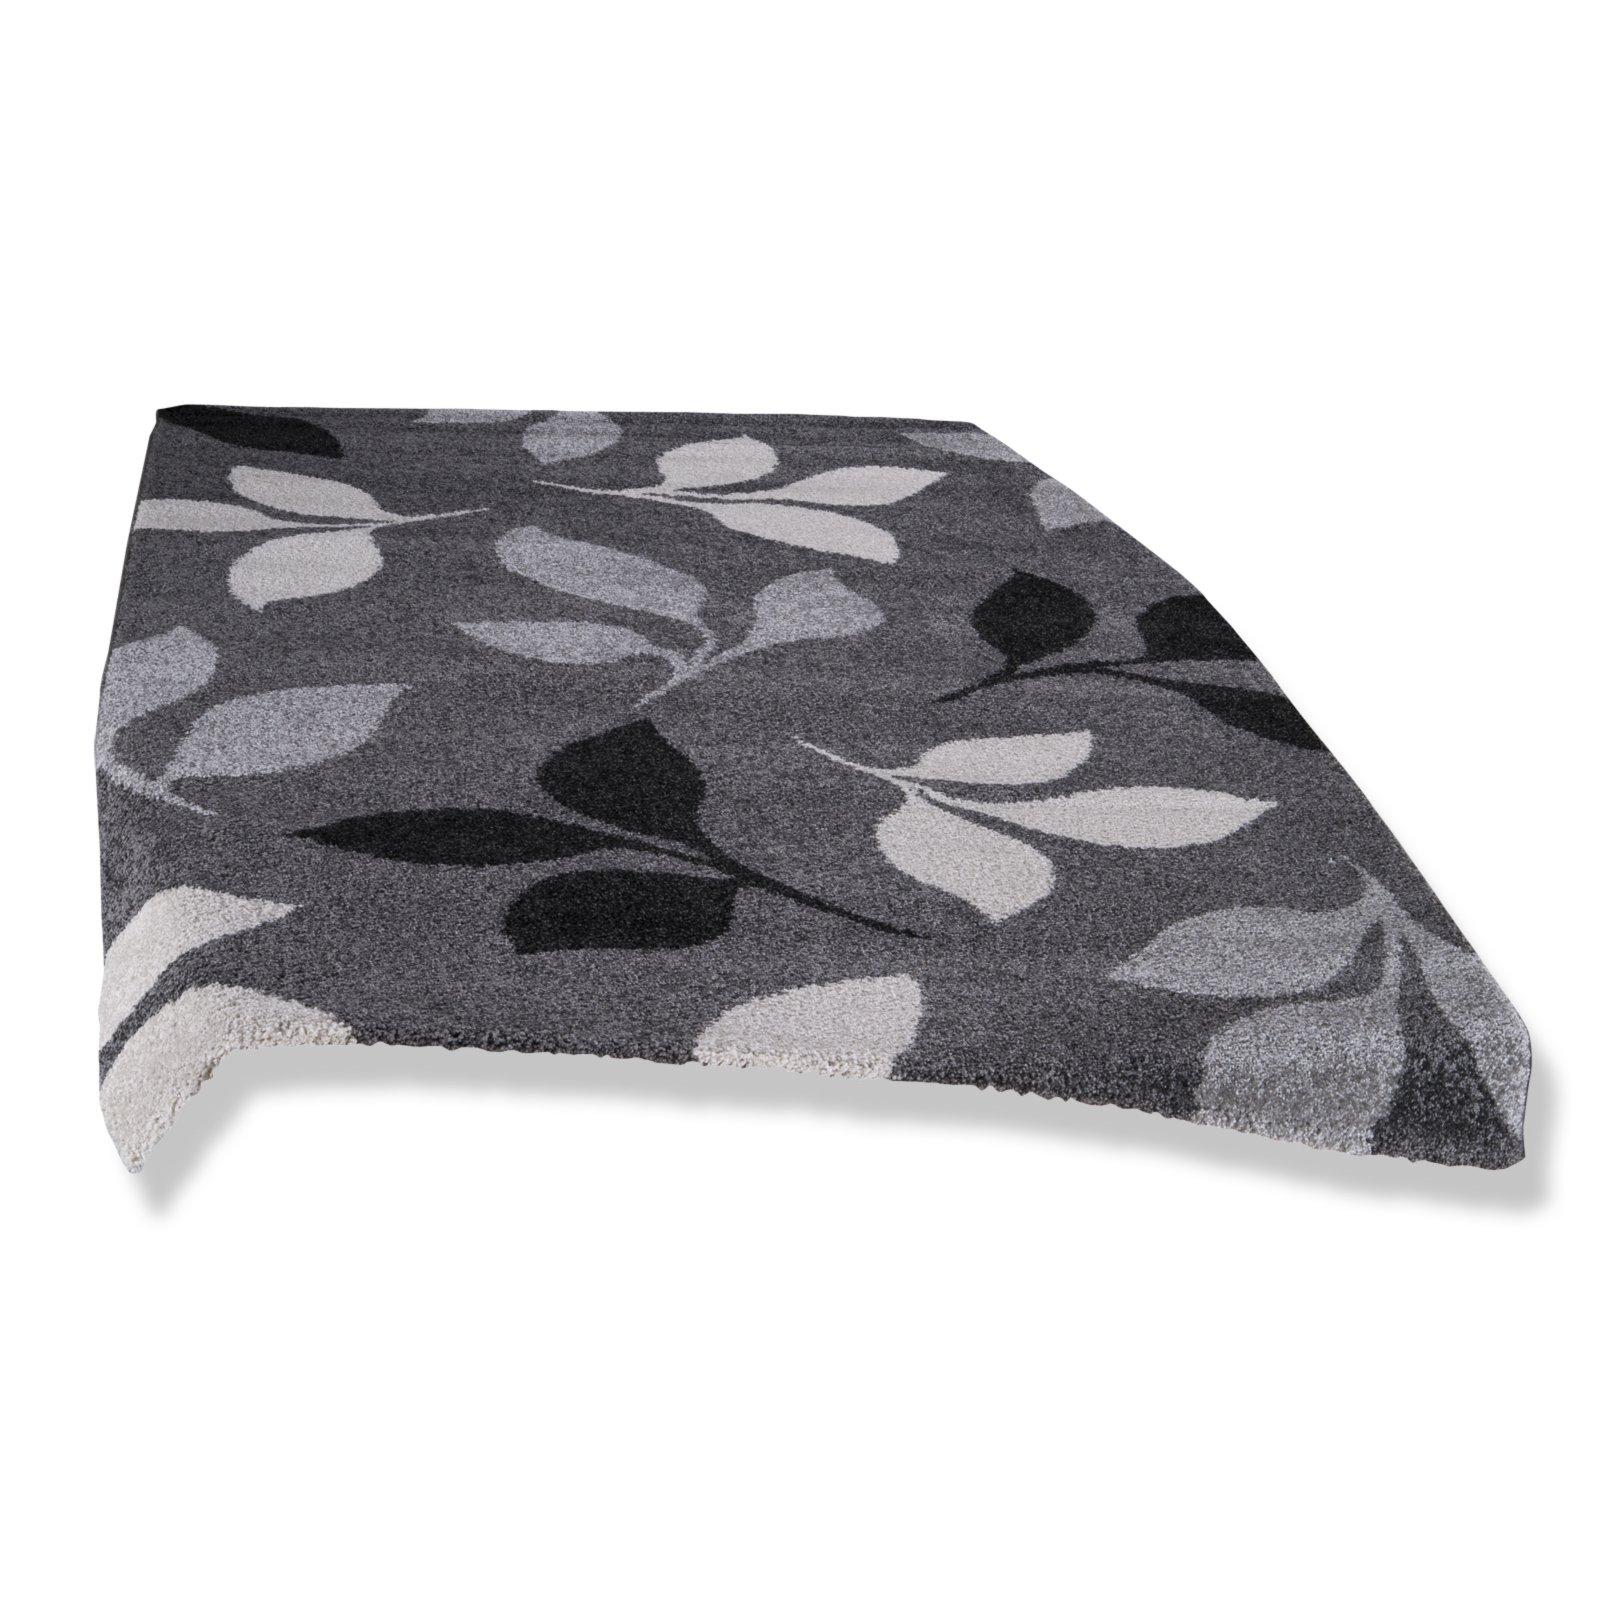 frisee teppich casa grau 200x290 cm gemusterte. Black Bedroom Furniture Sets. Home Design Ideas